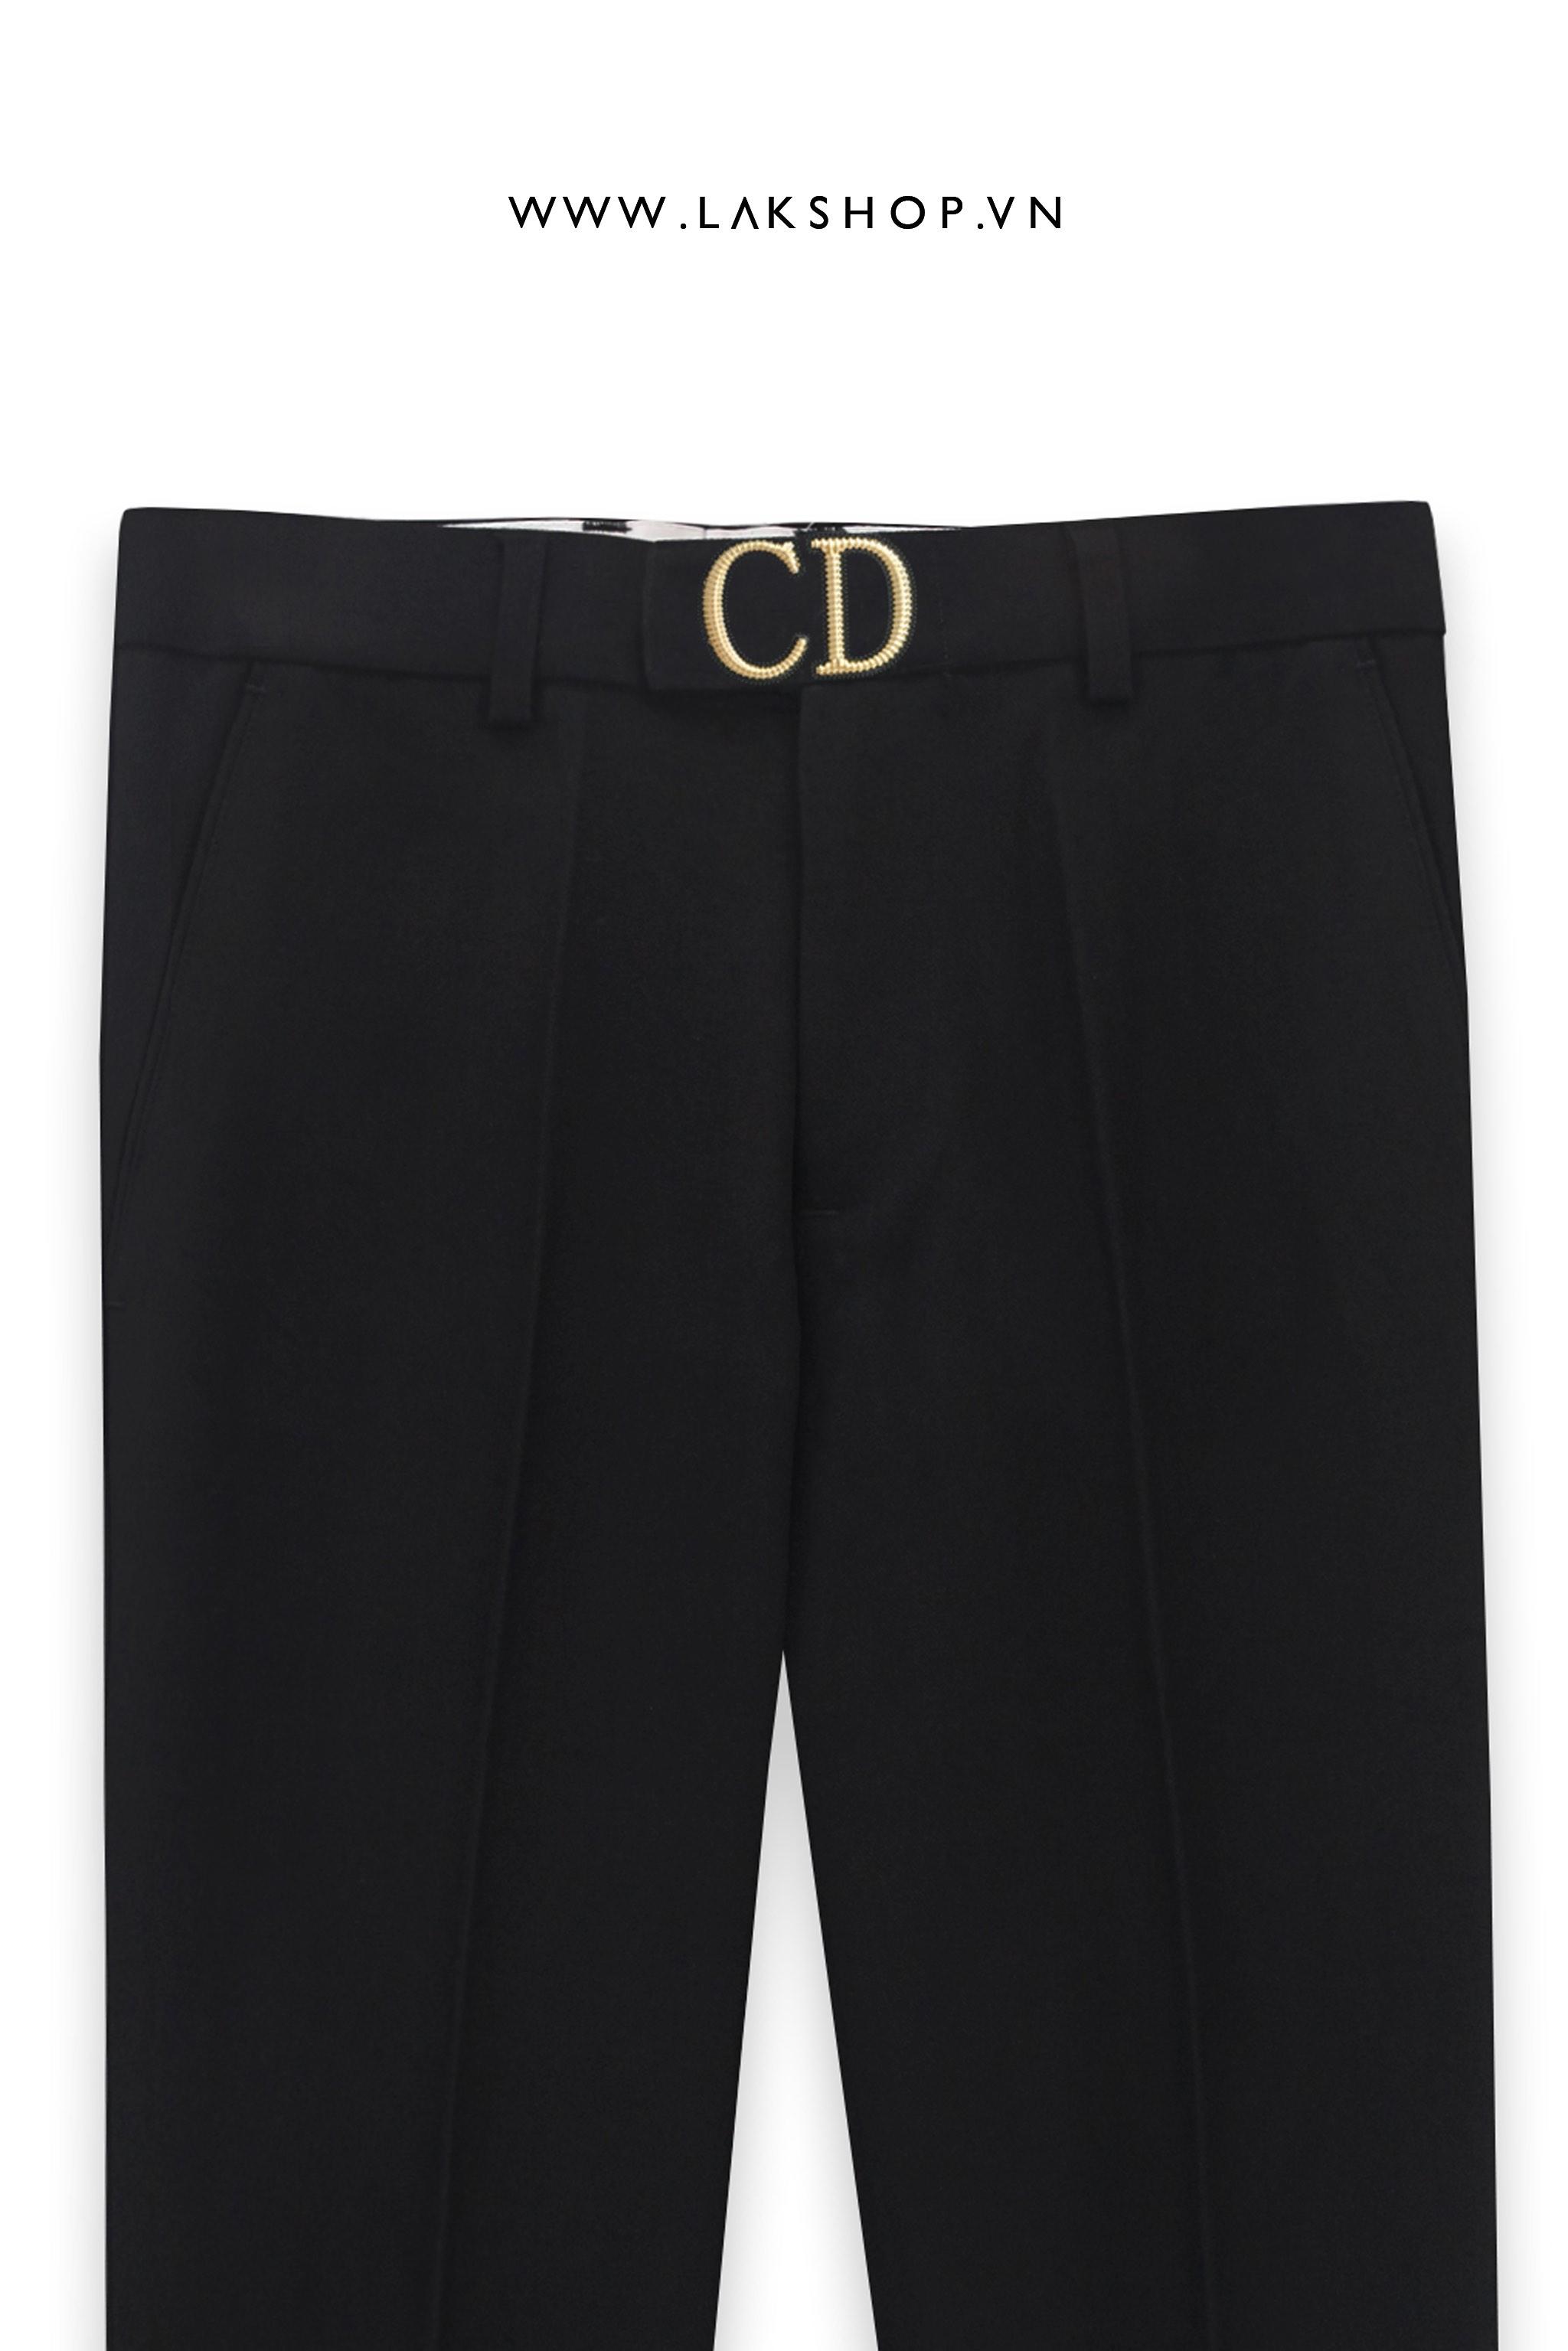 Dior CD Buckle Black Trouser